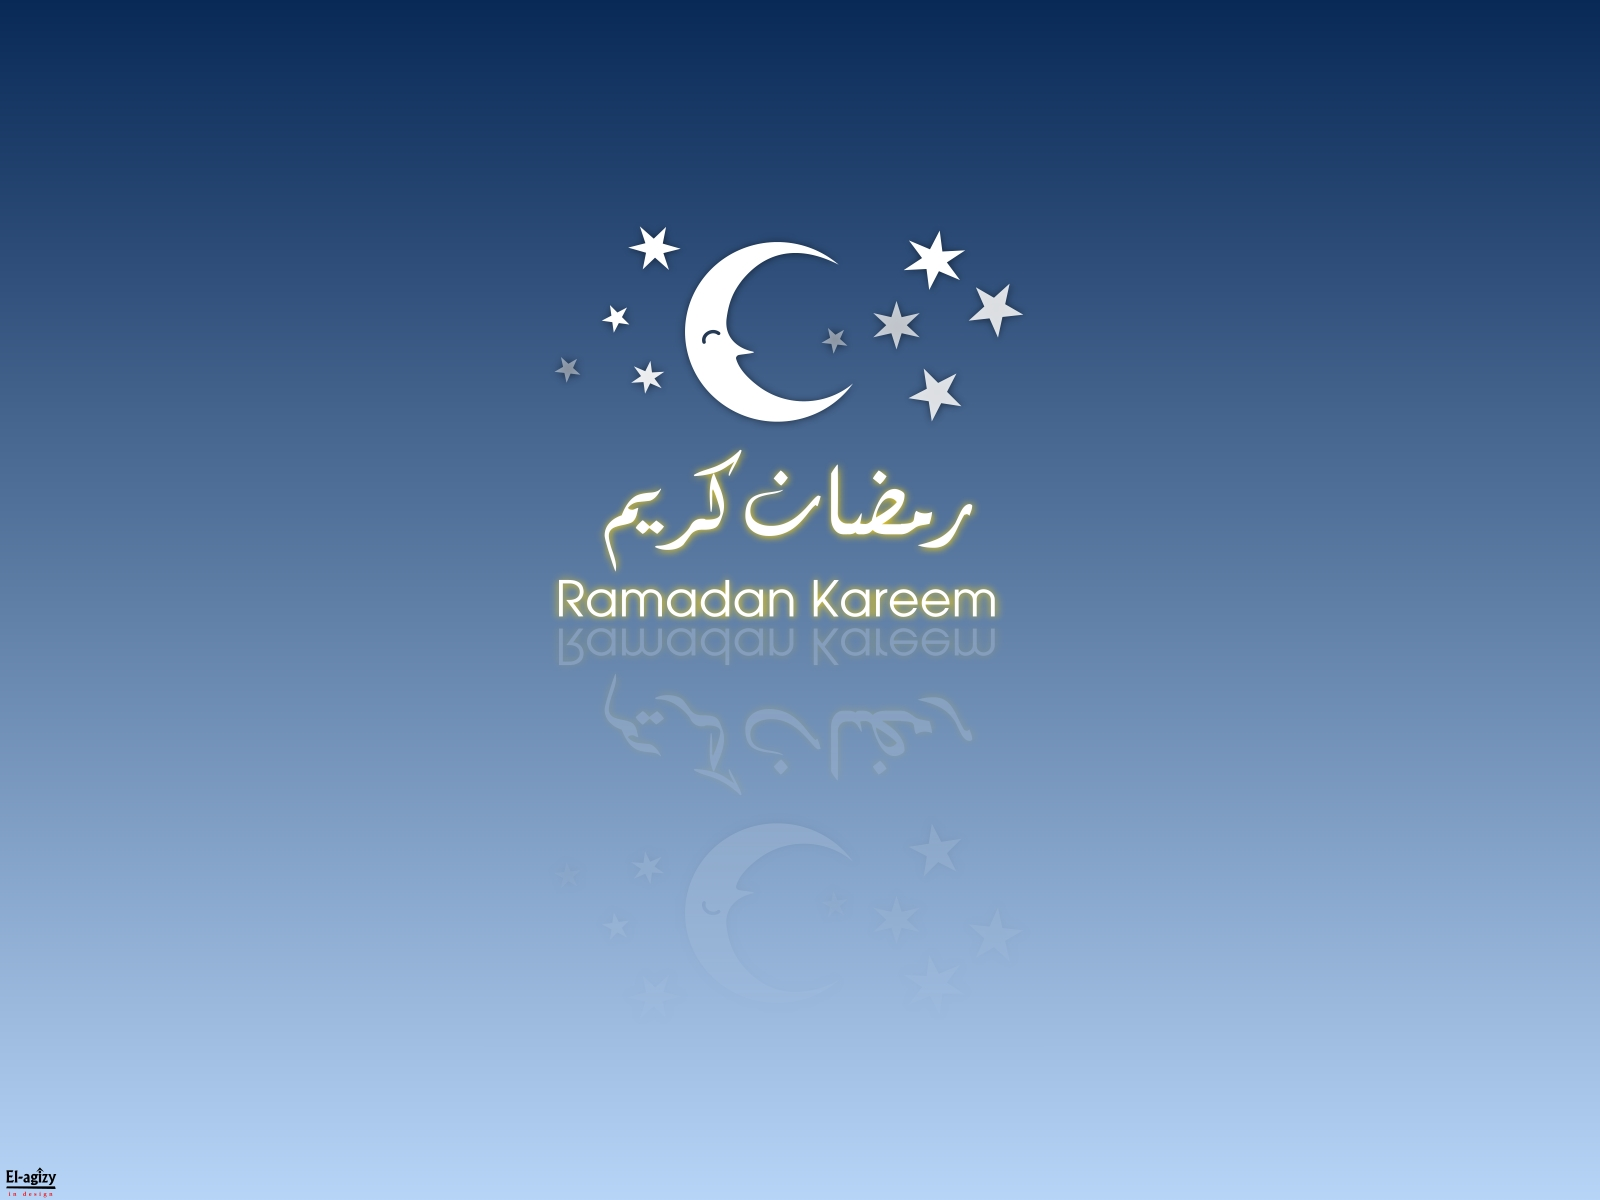 http://3.bp.blogspot.com/_ekkAmYDZVxE/TGHQ3hmlmiI/AAAAAAAAAaA/rsDMX4rxqak/s1600/Ramadan+Kareem2.jpg